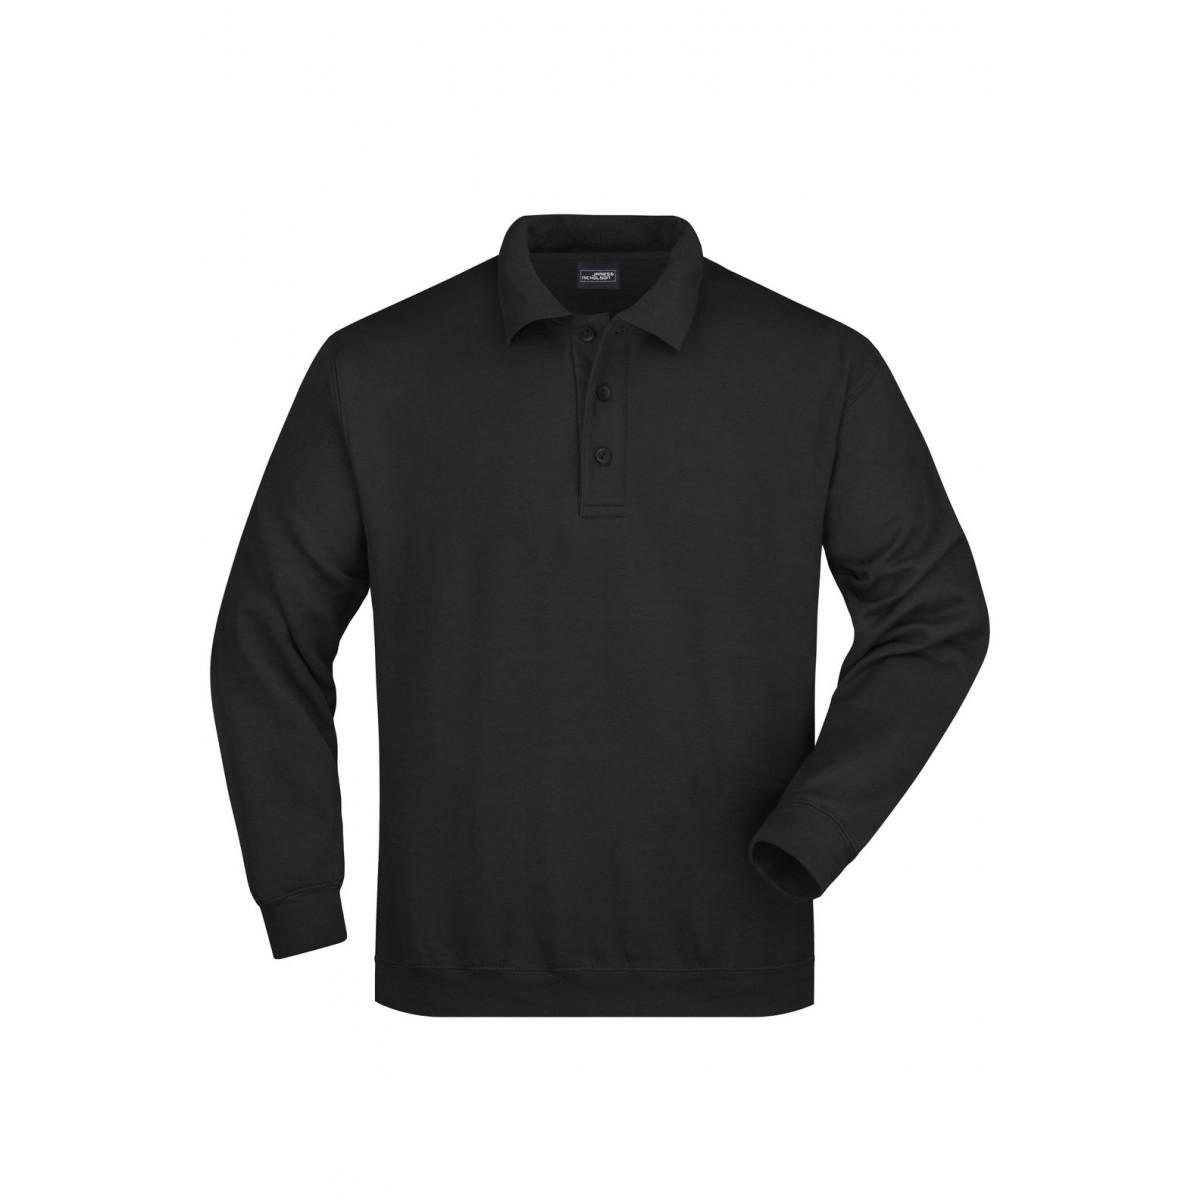 Толстовка мужская JN041 Polo Sweat Heavy - Черный